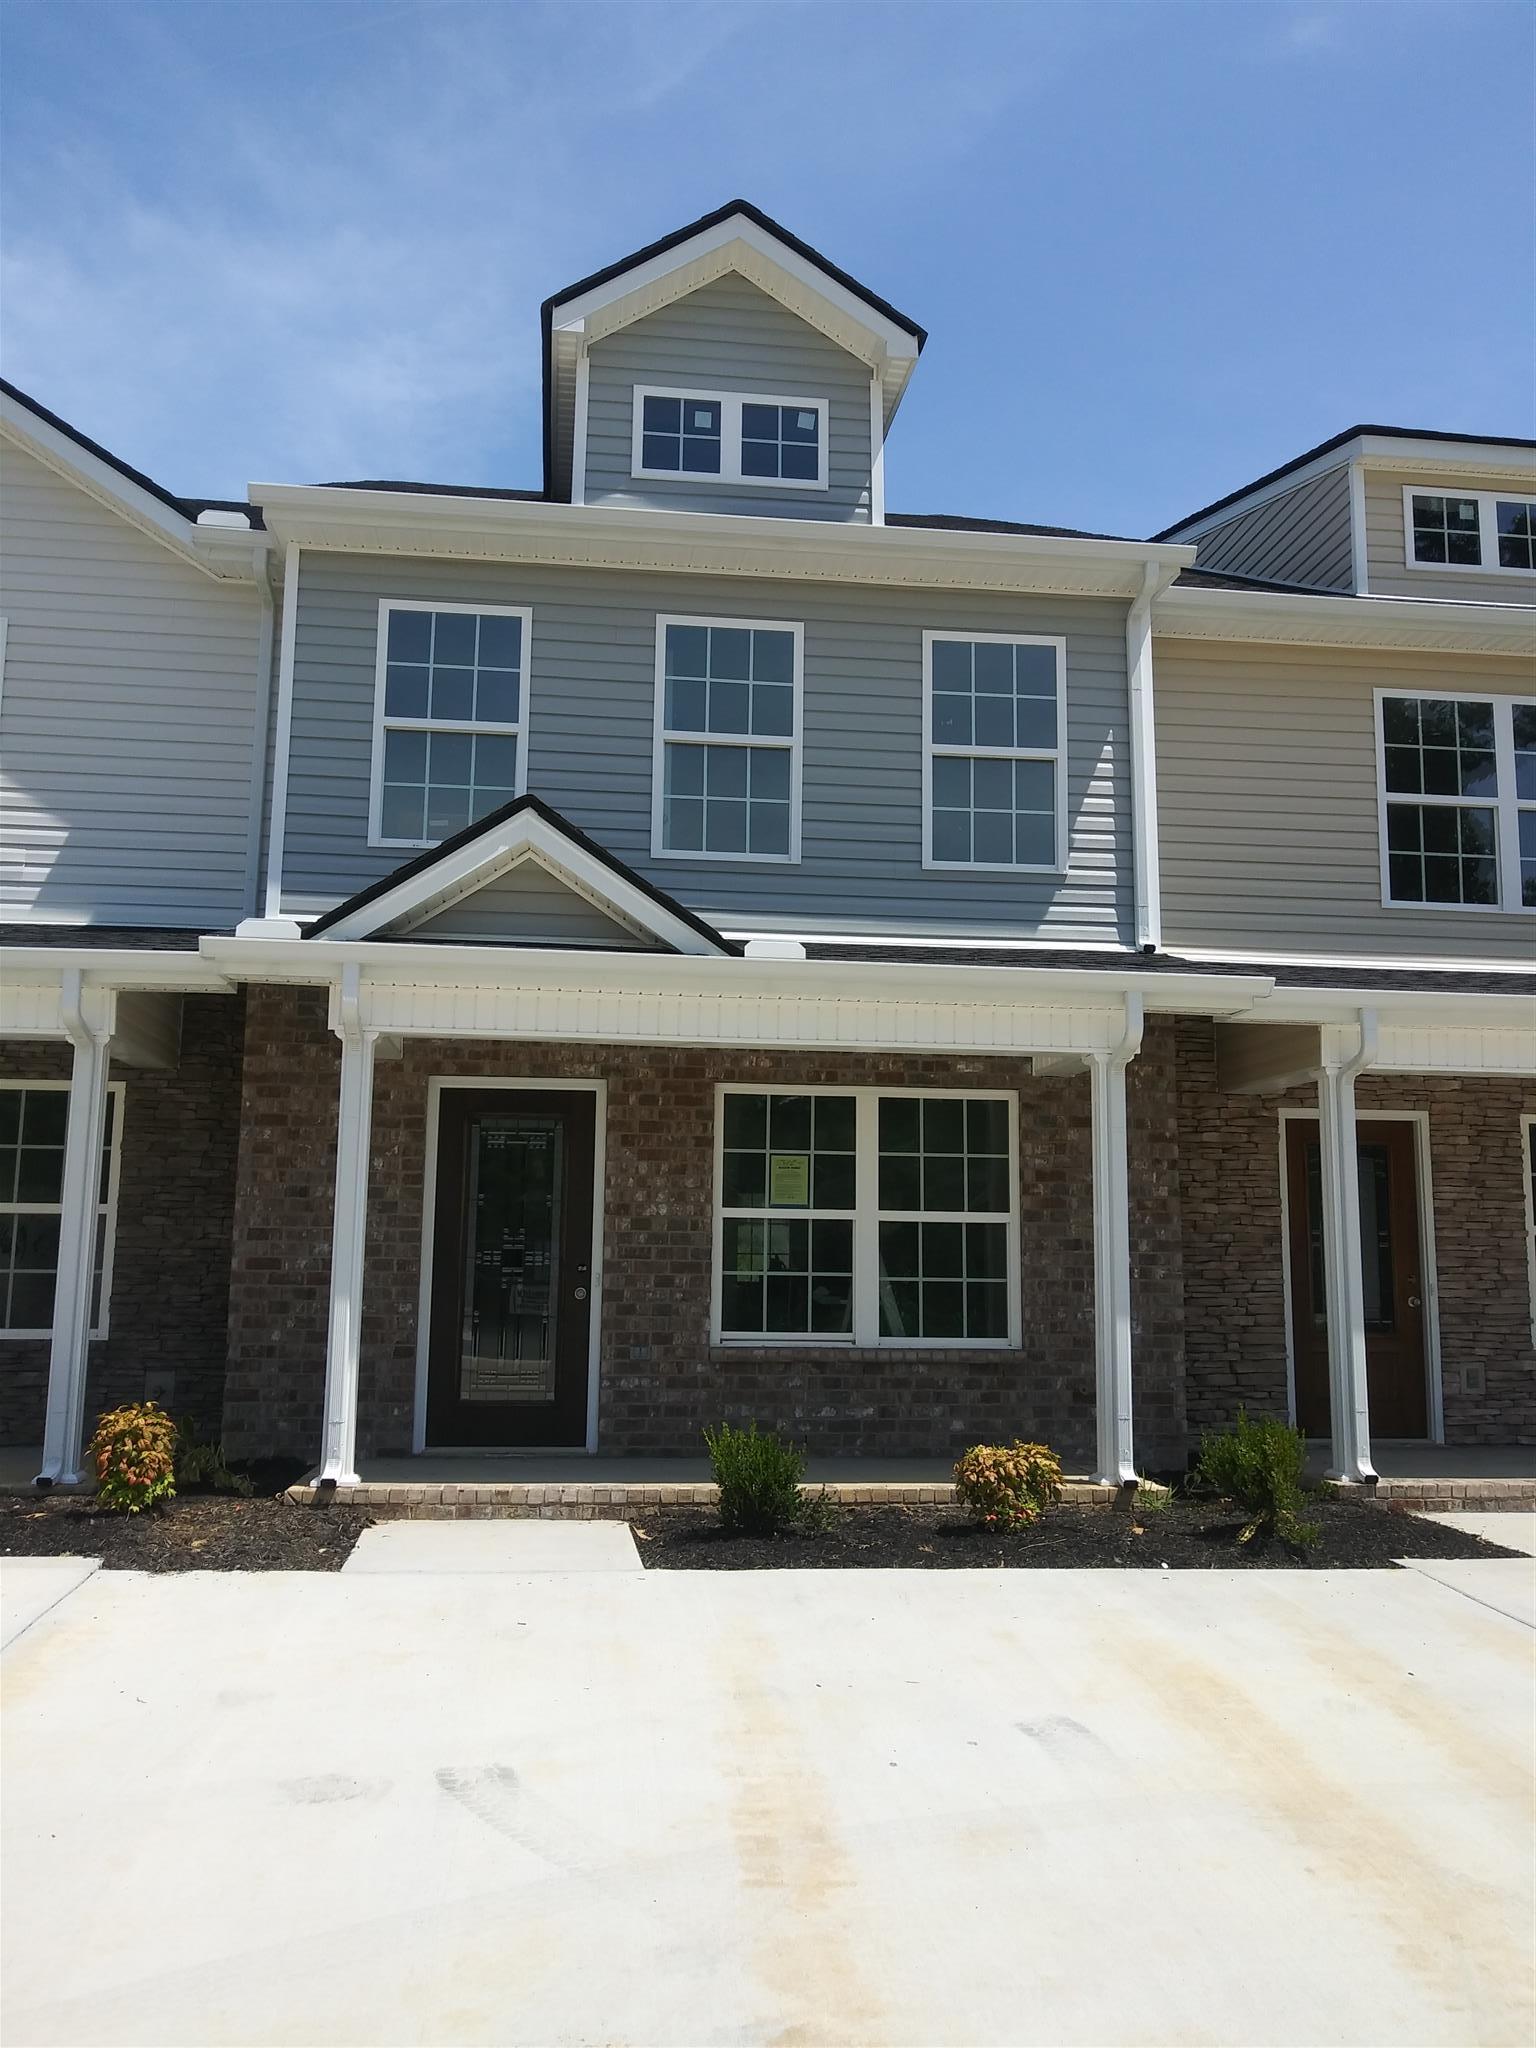 20 Lot 20 Downstream, Ashland City, TN 37015 - Ashland City, TN real estate listing